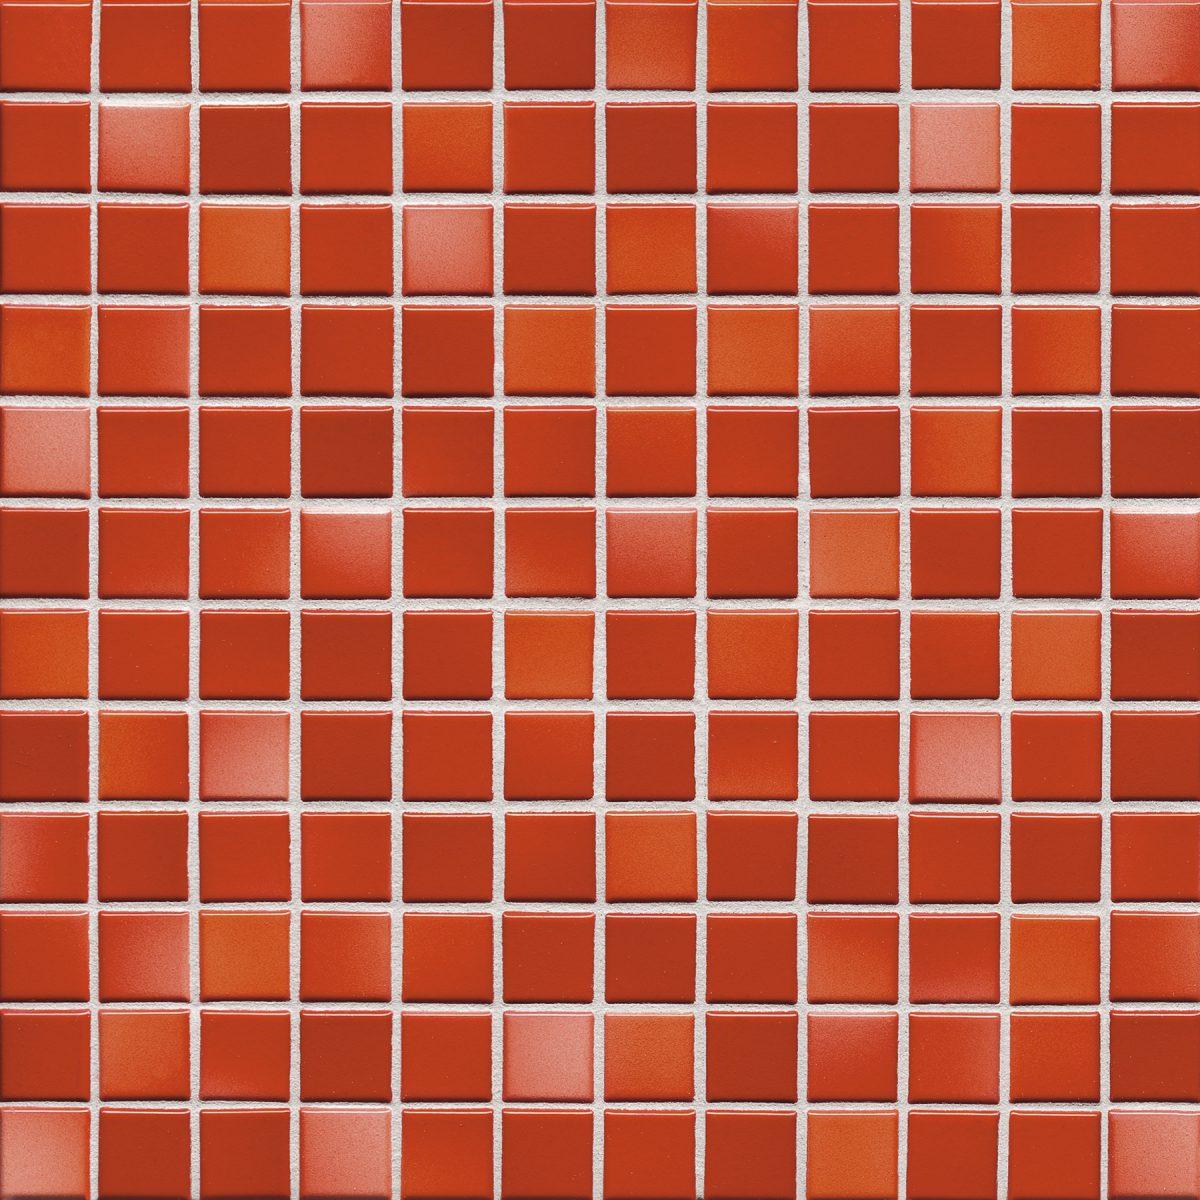 Мозаика серия Fresh 2,4 X 2,4 см Coral Red Mix Glossy (глазурованная)